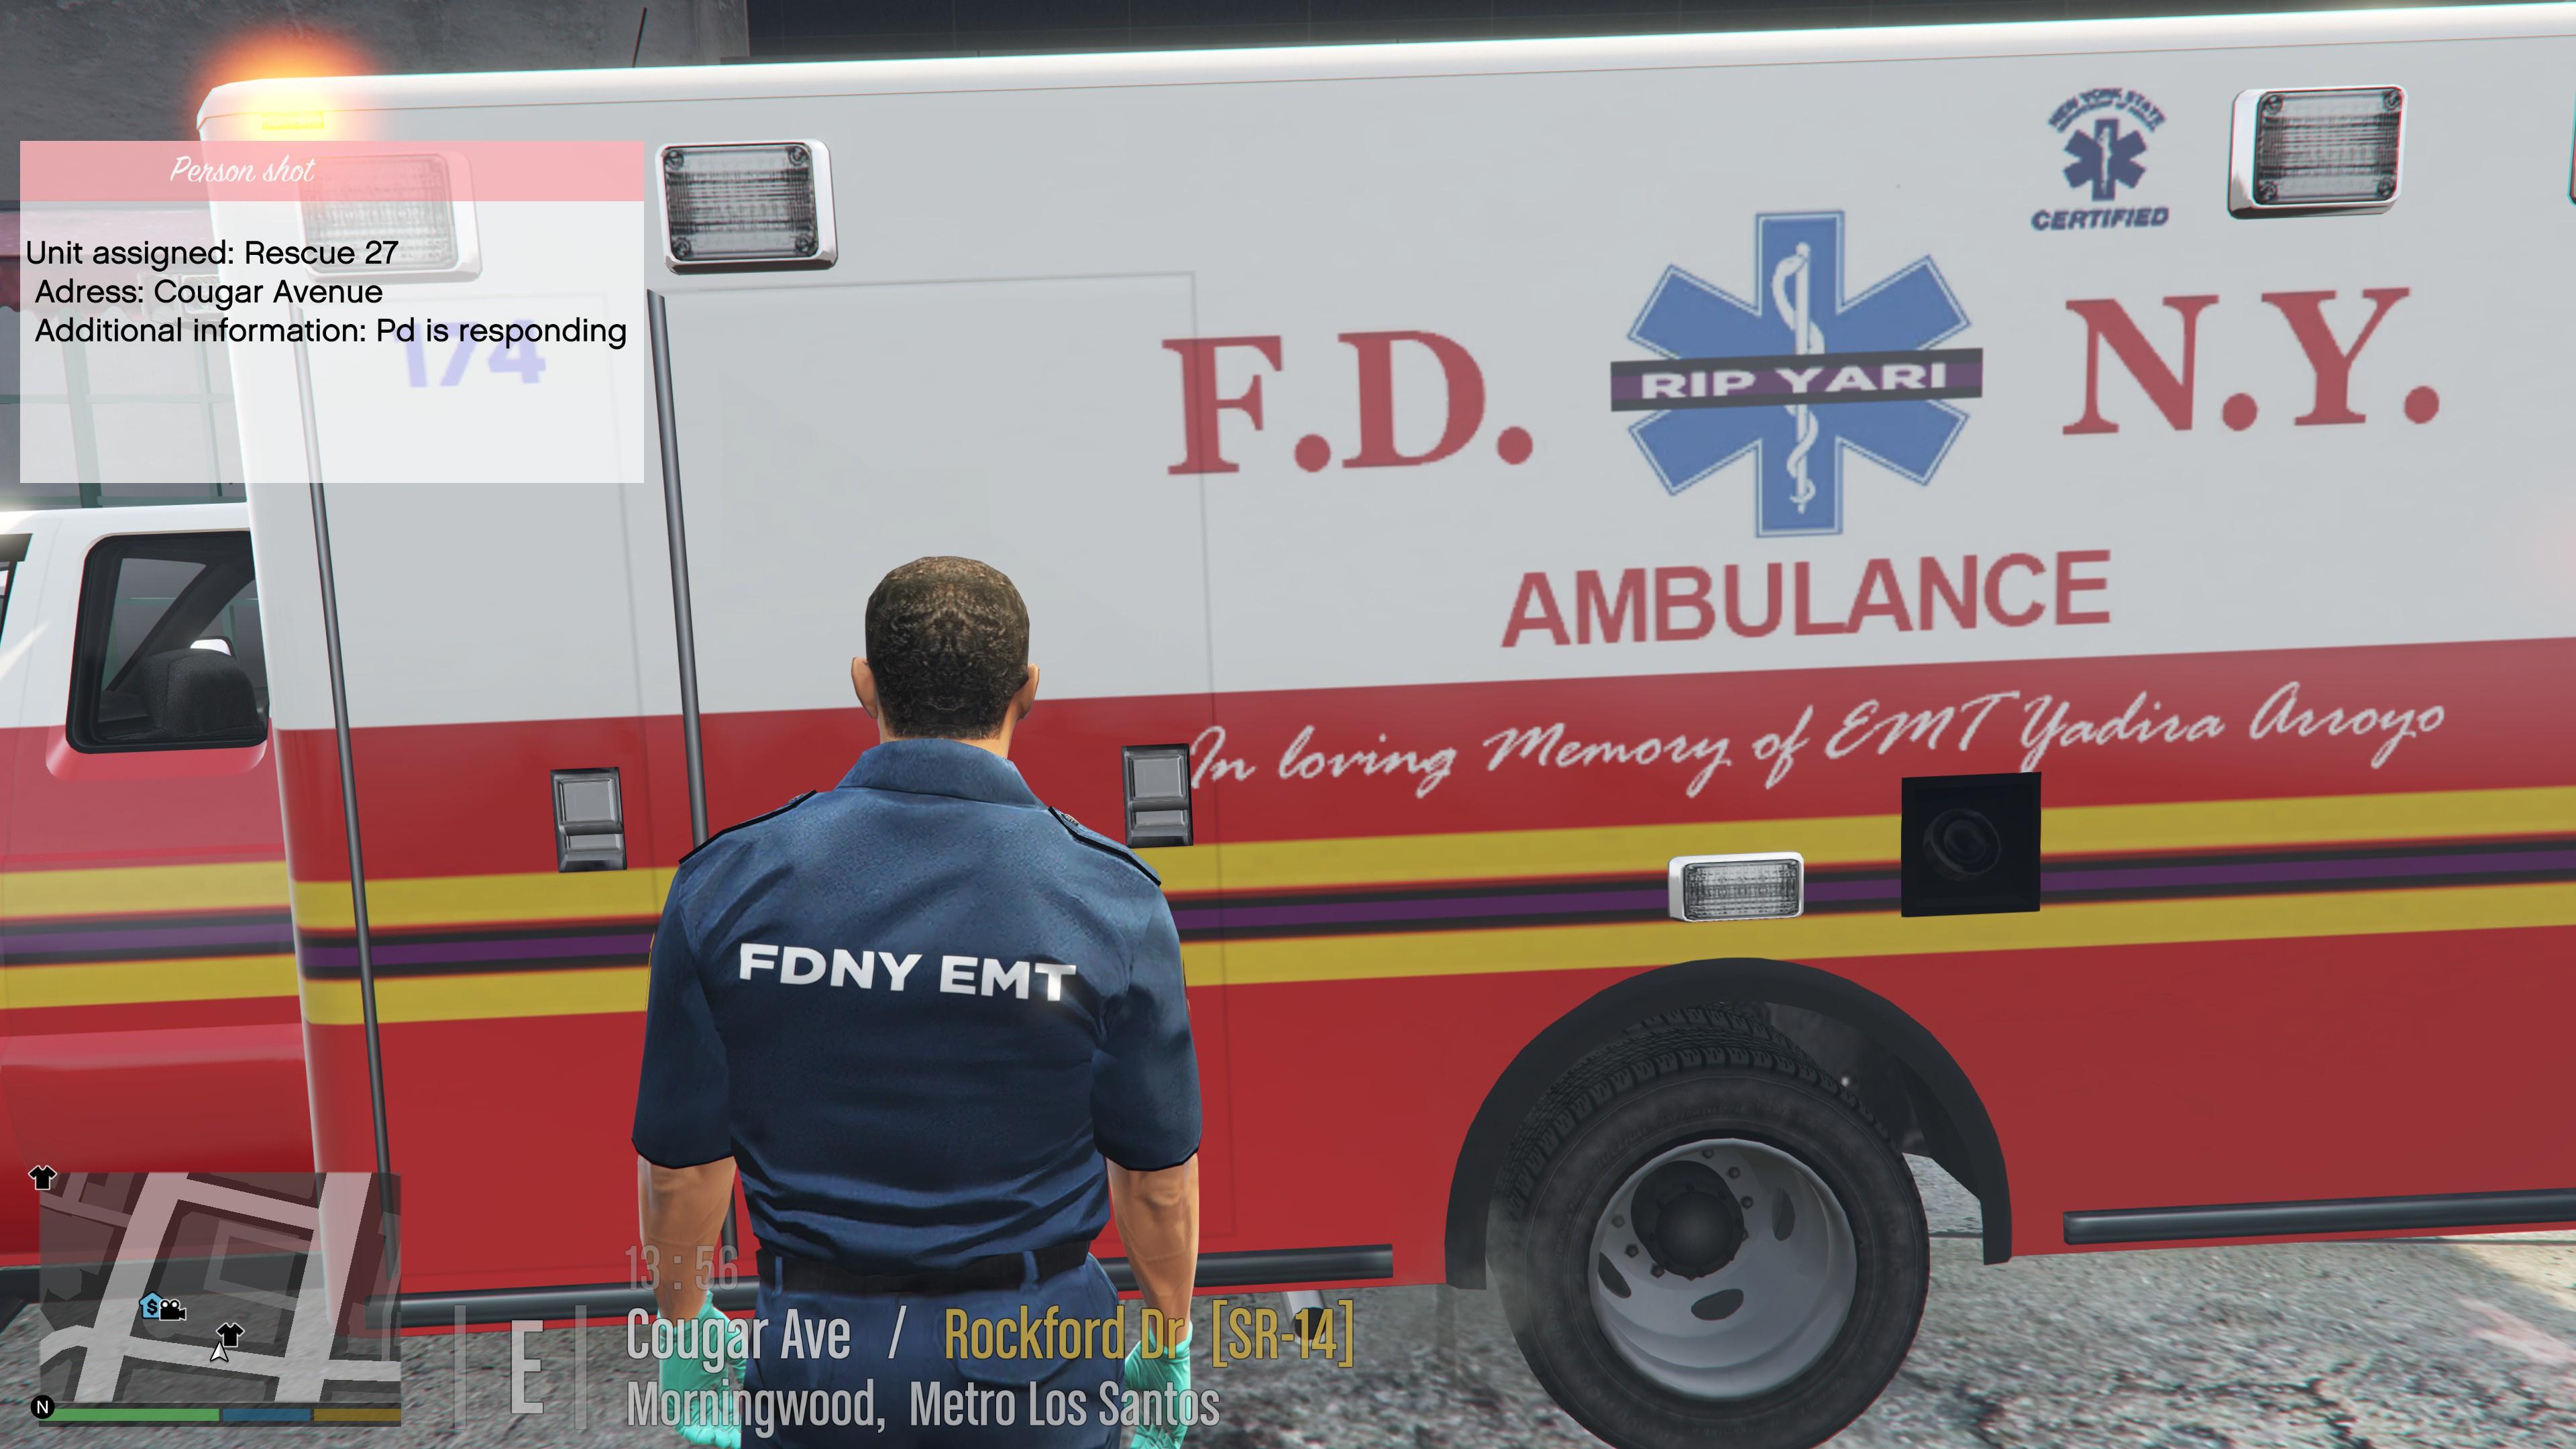 Fdny Emt And Paramedic Uniform Texture Gta5 Mods Com